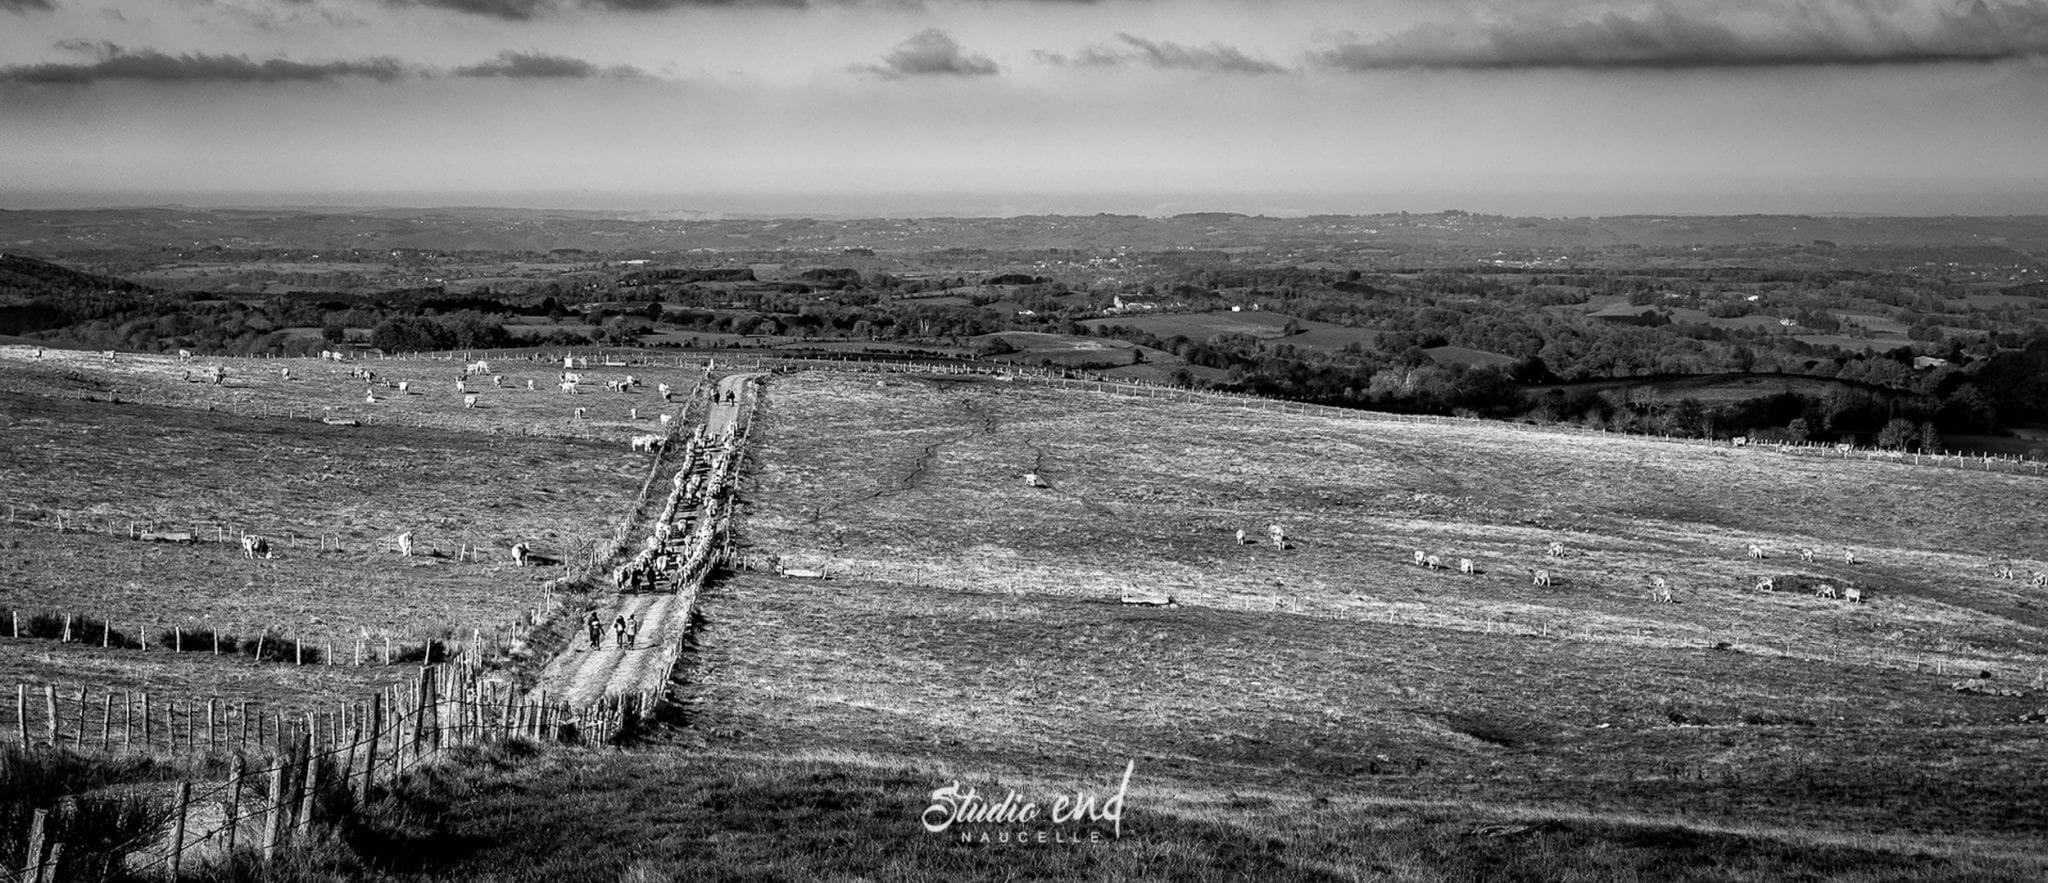 Vue drone de champs de brebis campagne Studio End